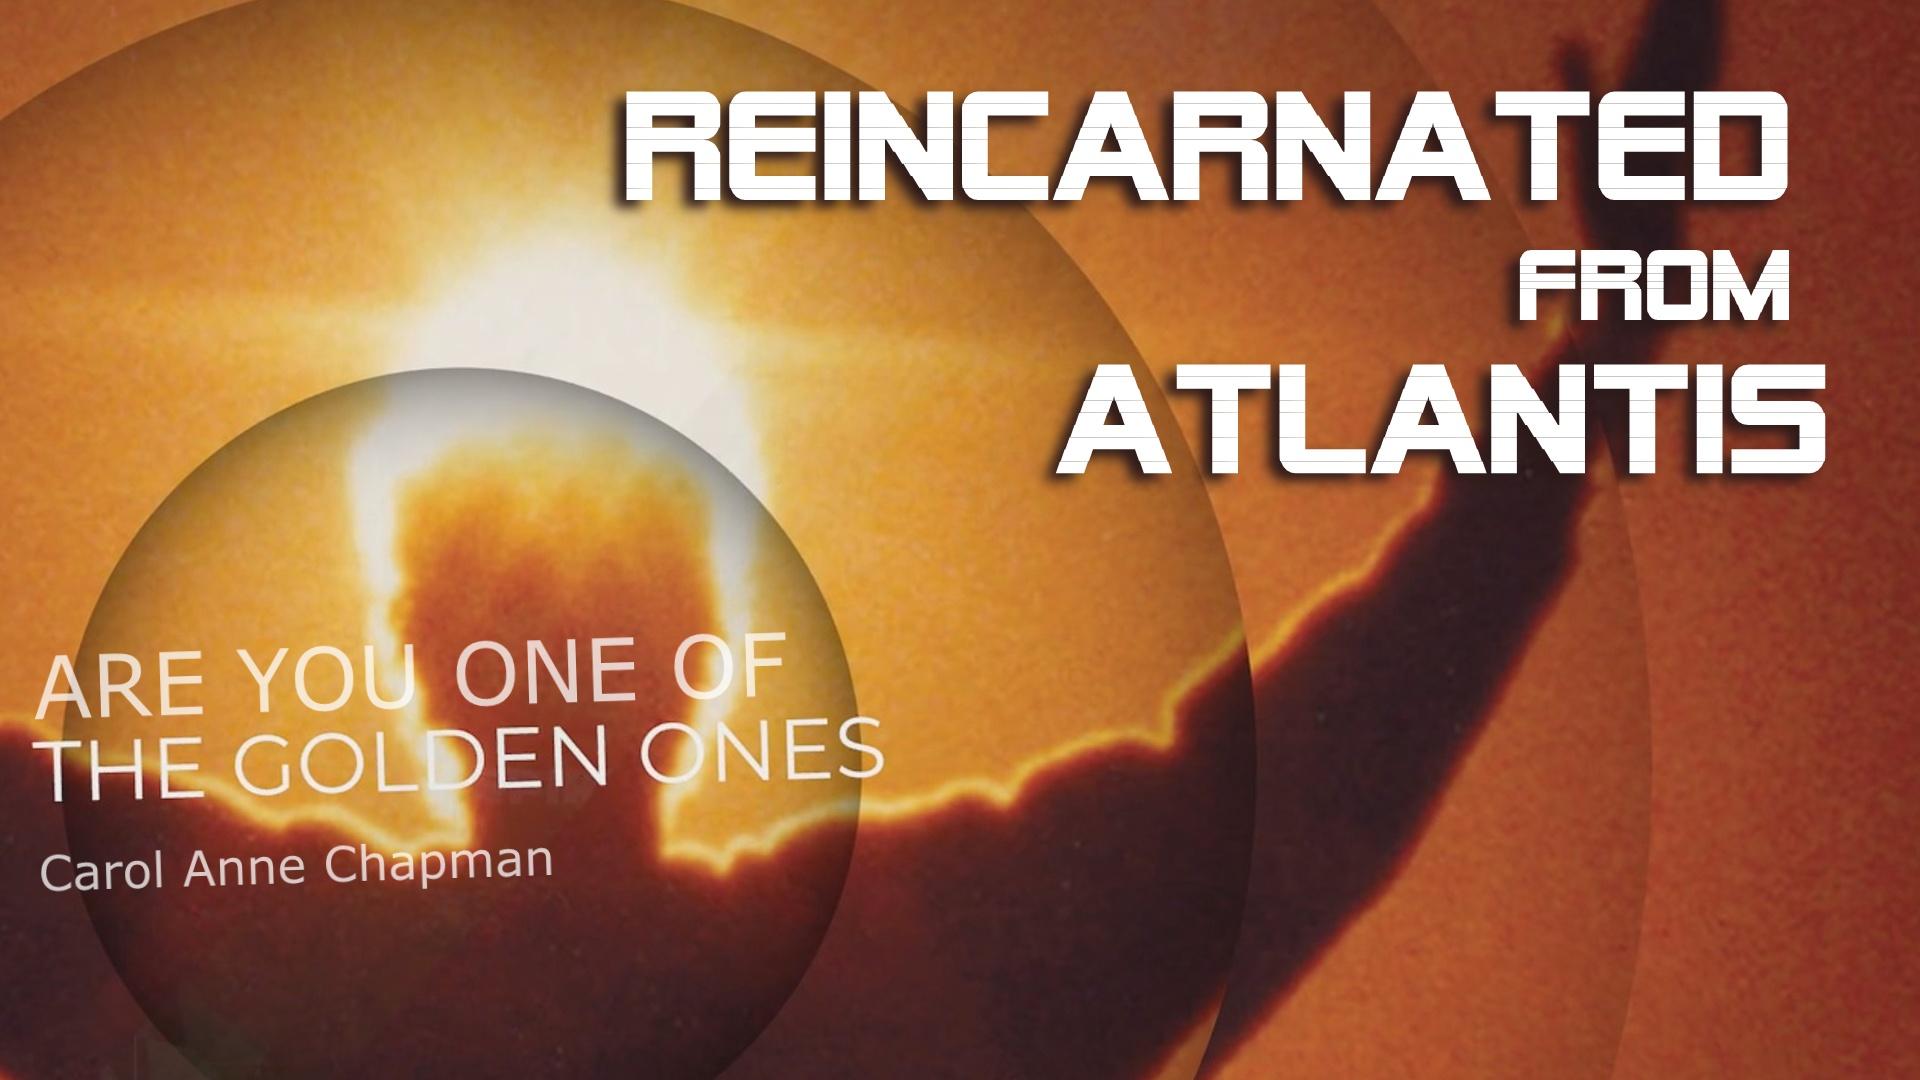 Reincarnated from Atlantis